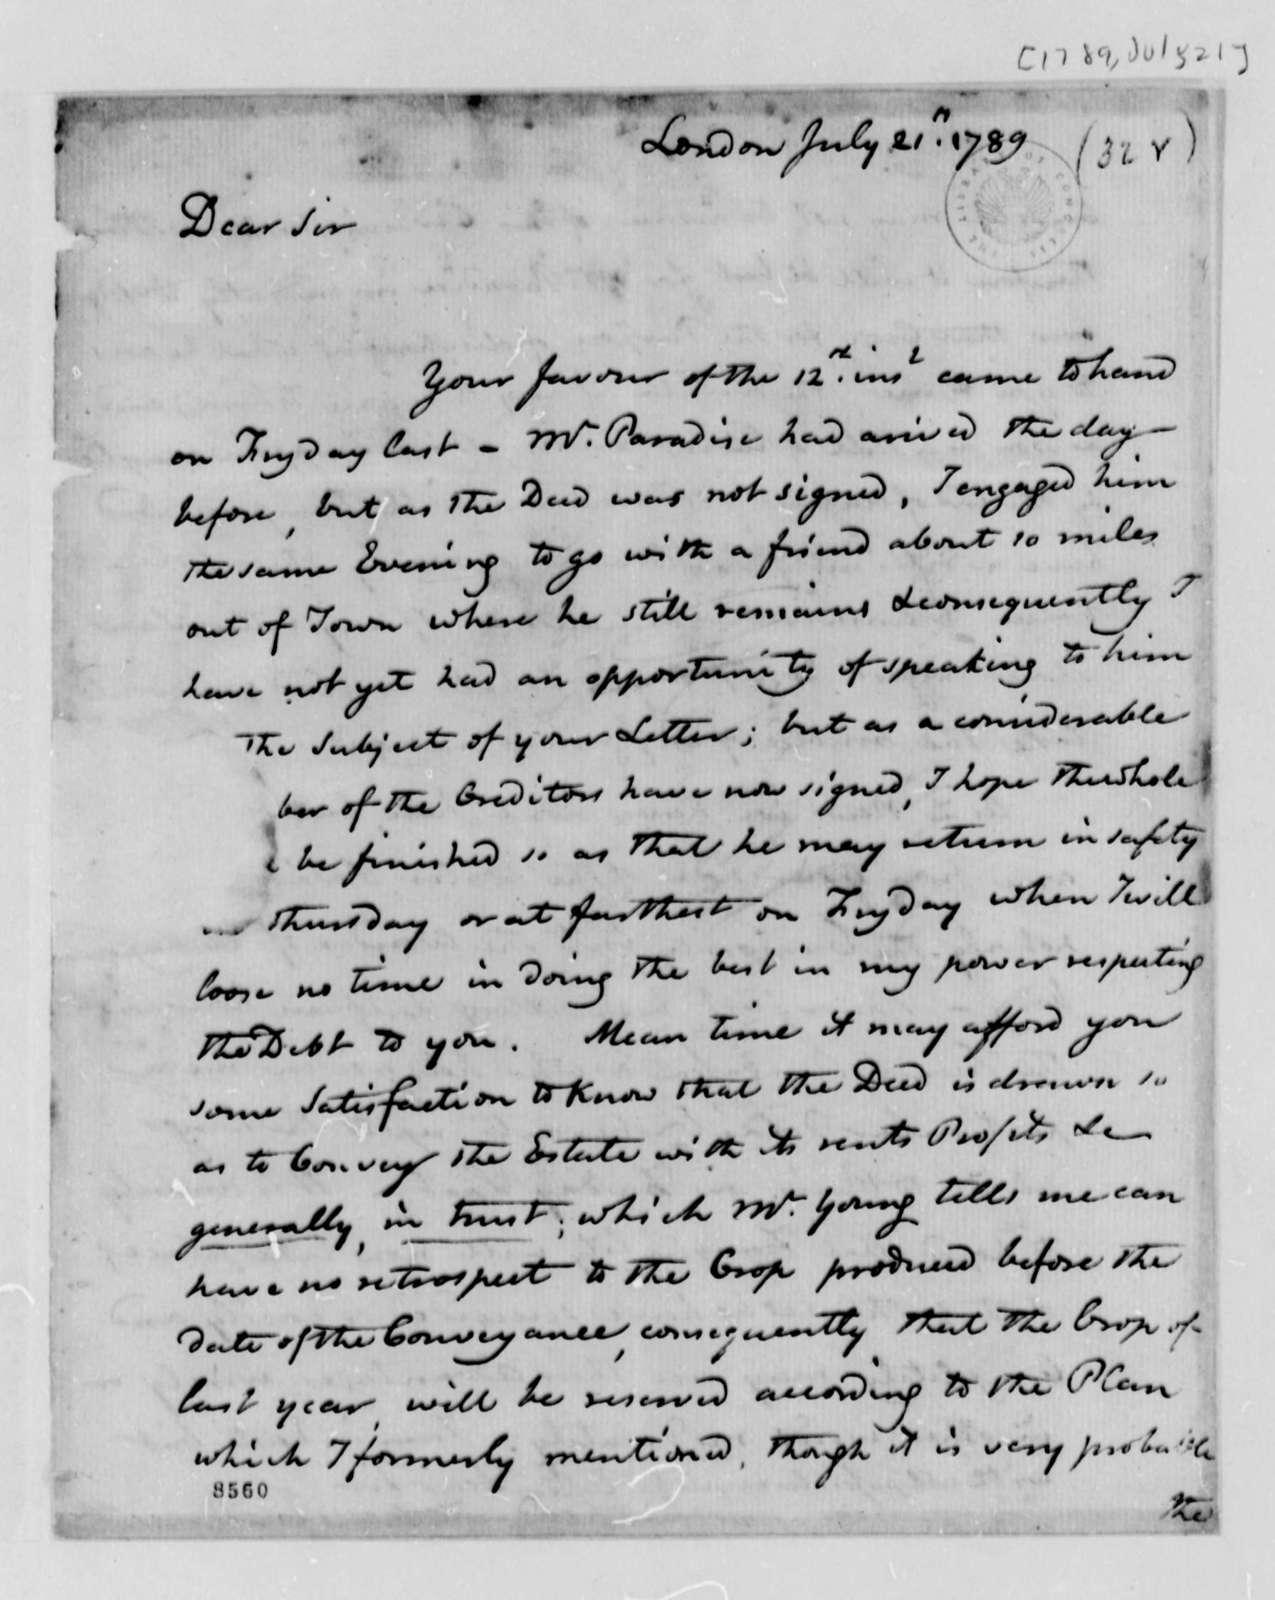 Edward Bancroft to Thomas Jefferson, July 21, 1789